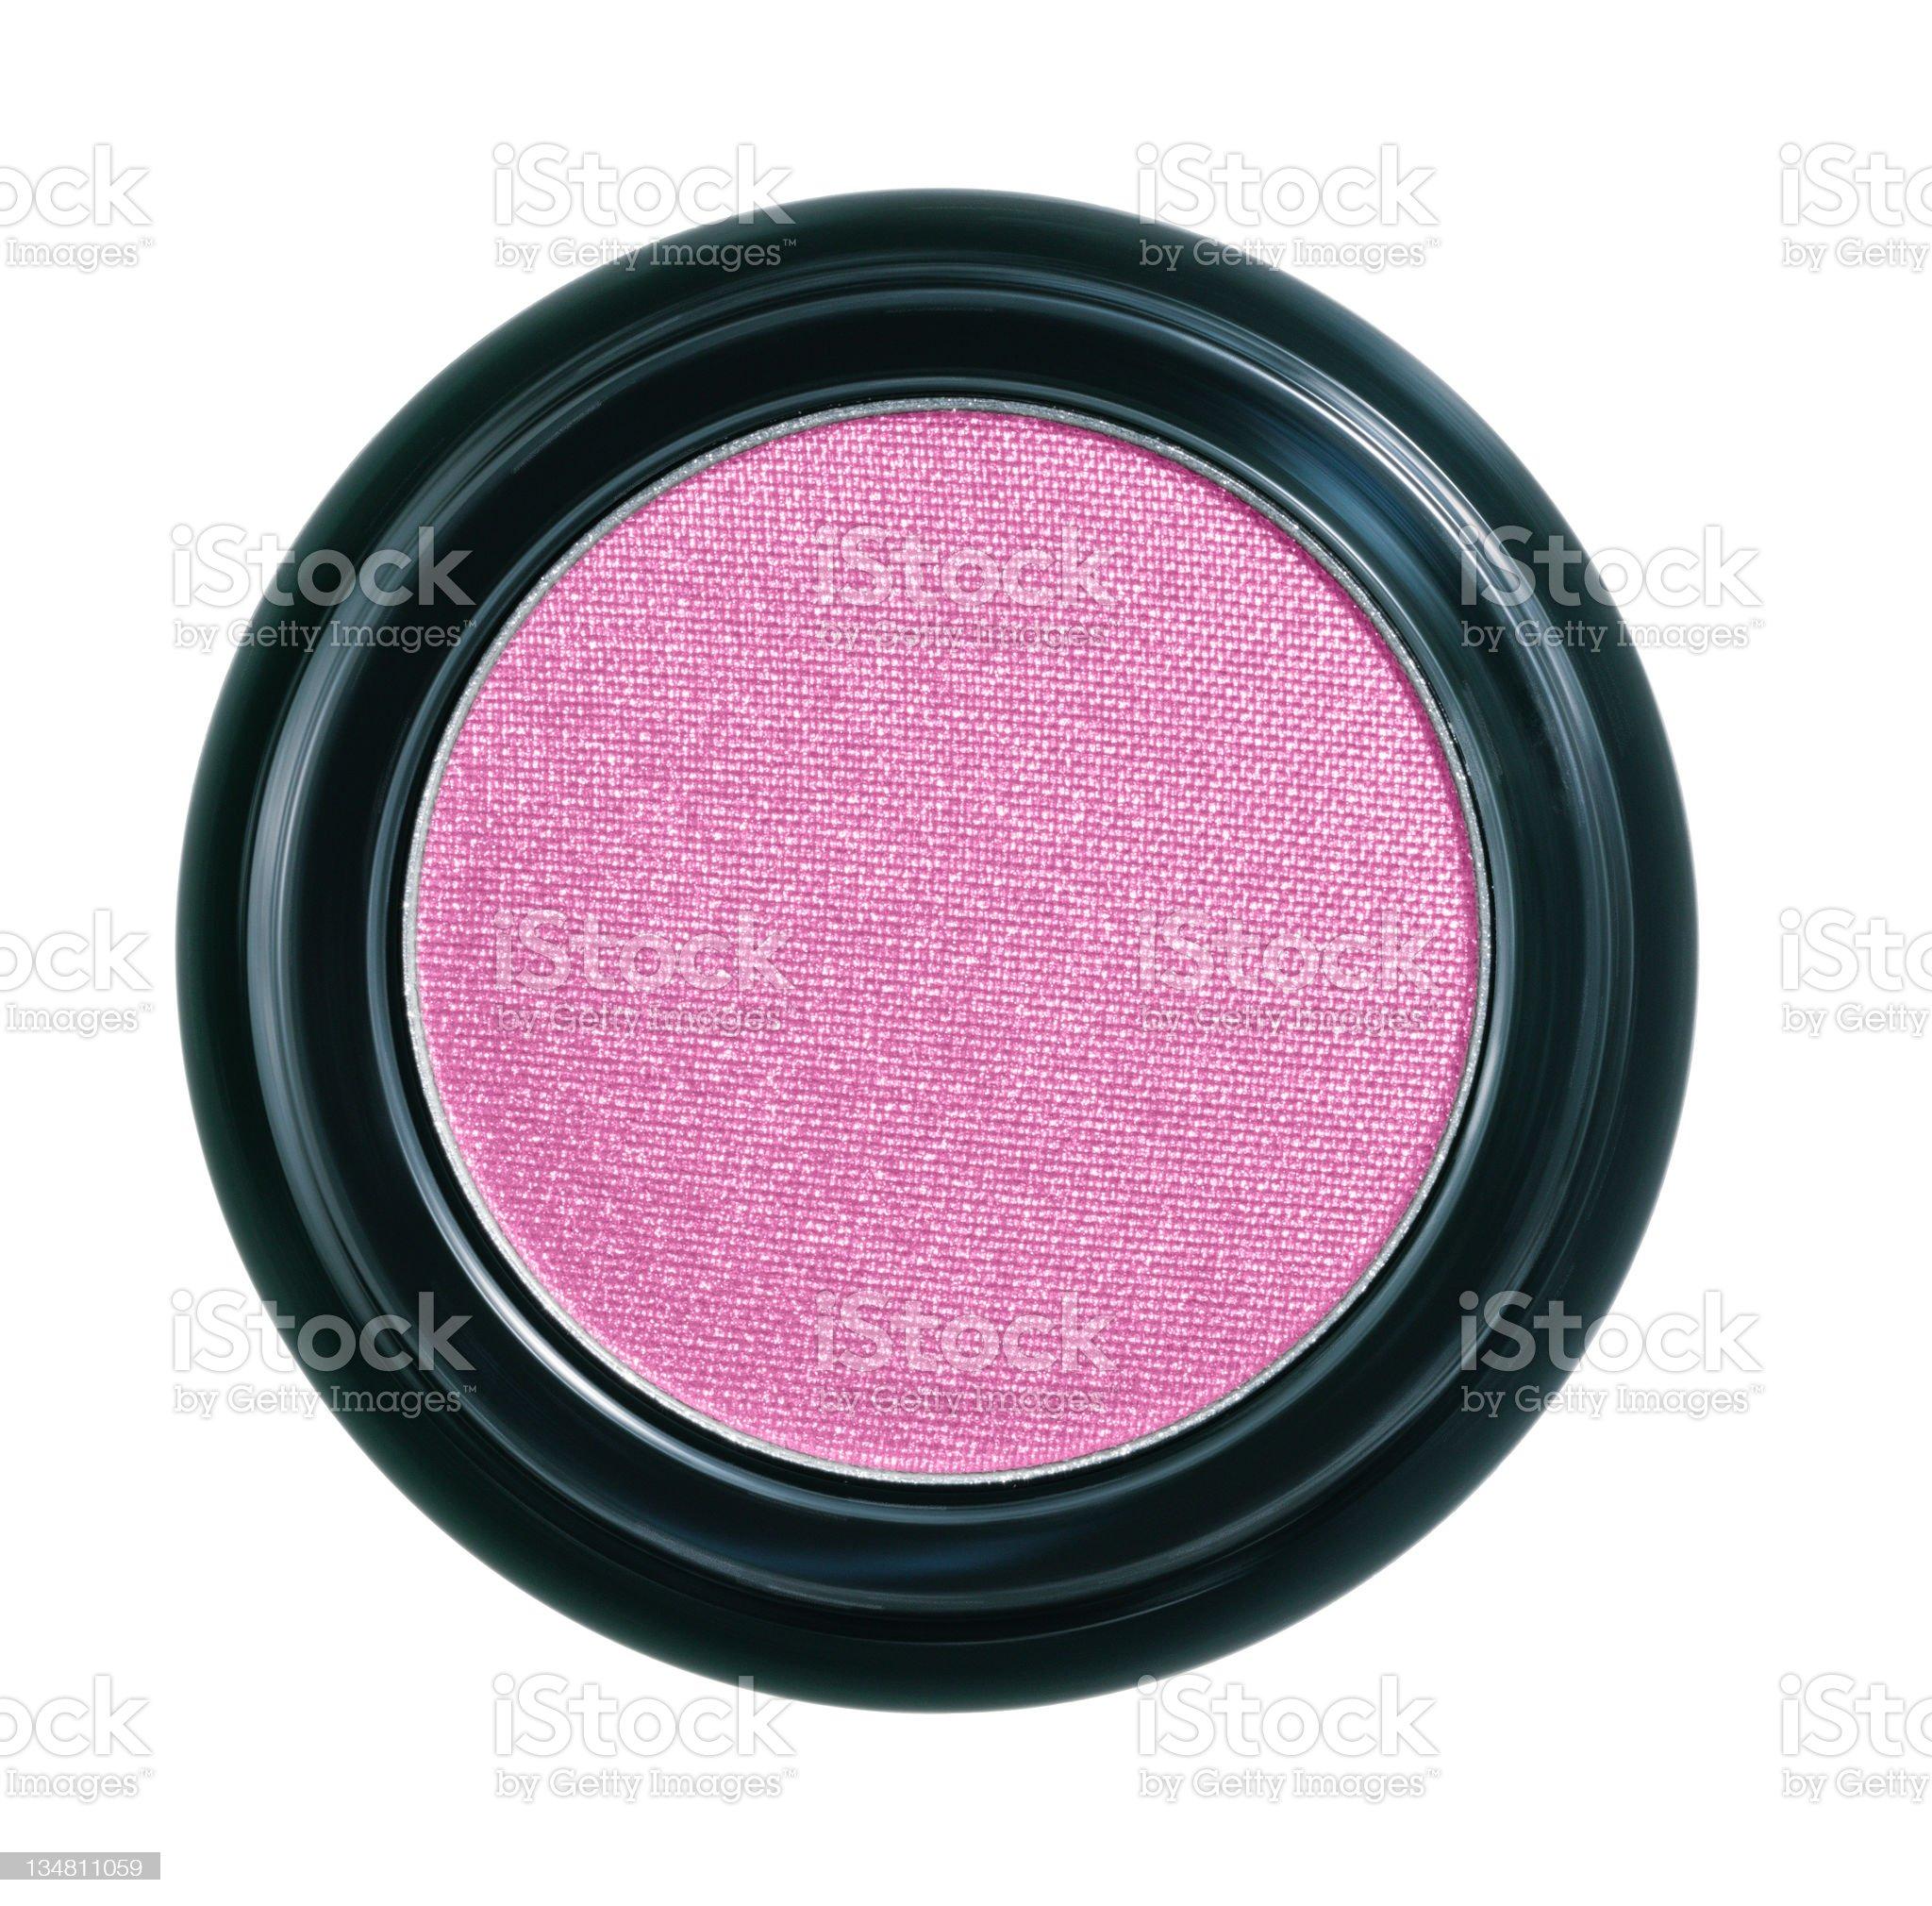 Powder blush royalty-free stock photo